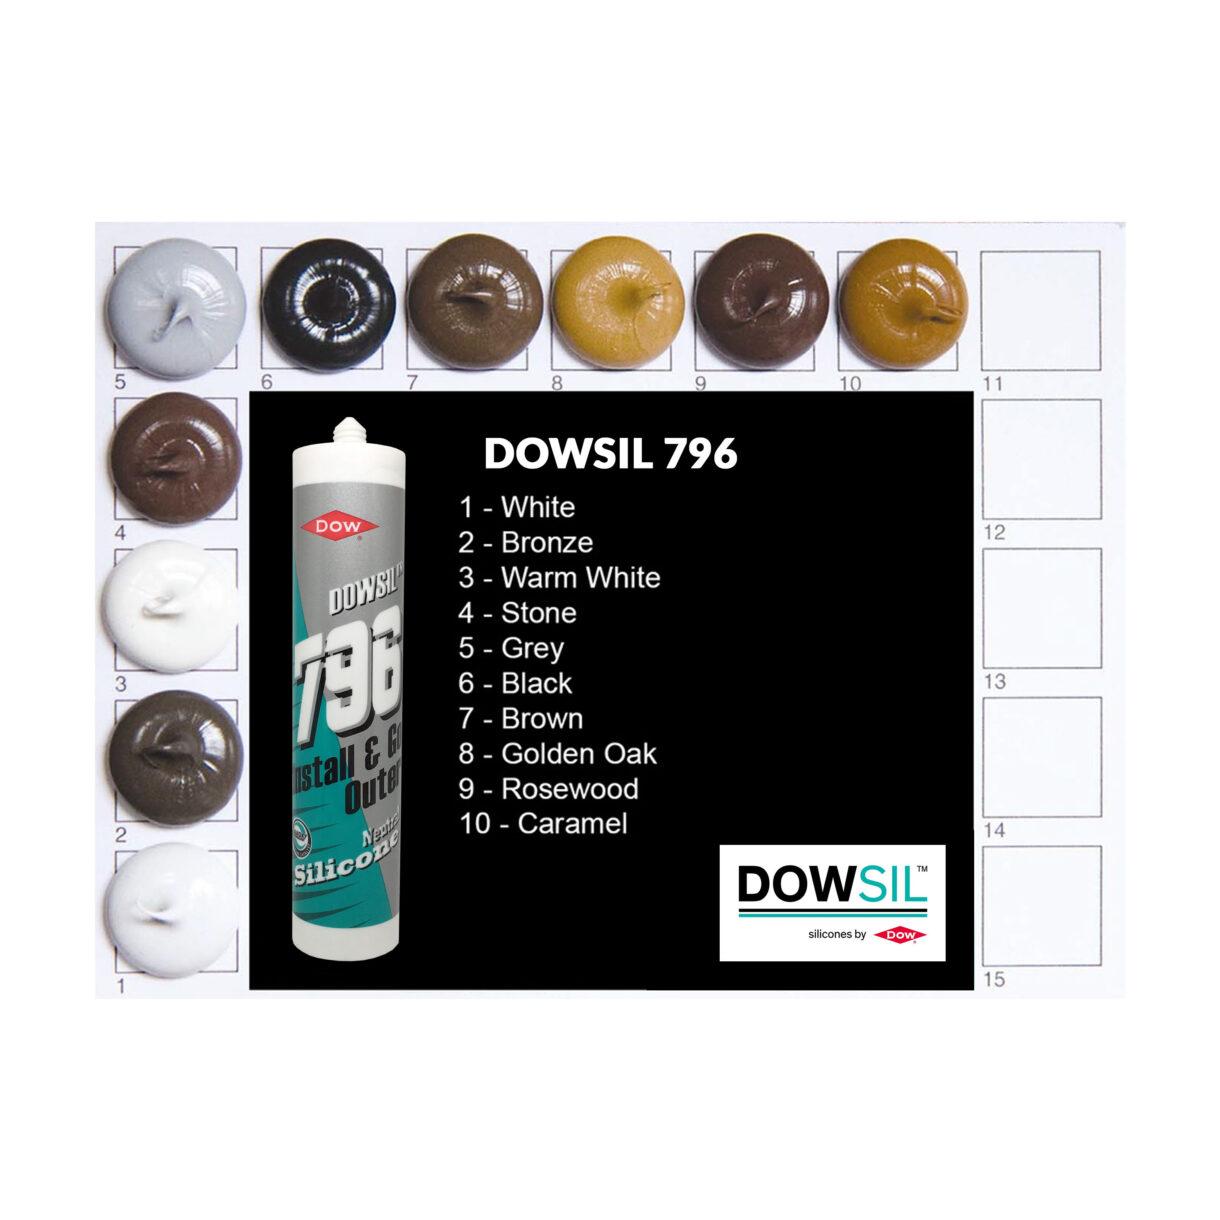 DOWSIL 796